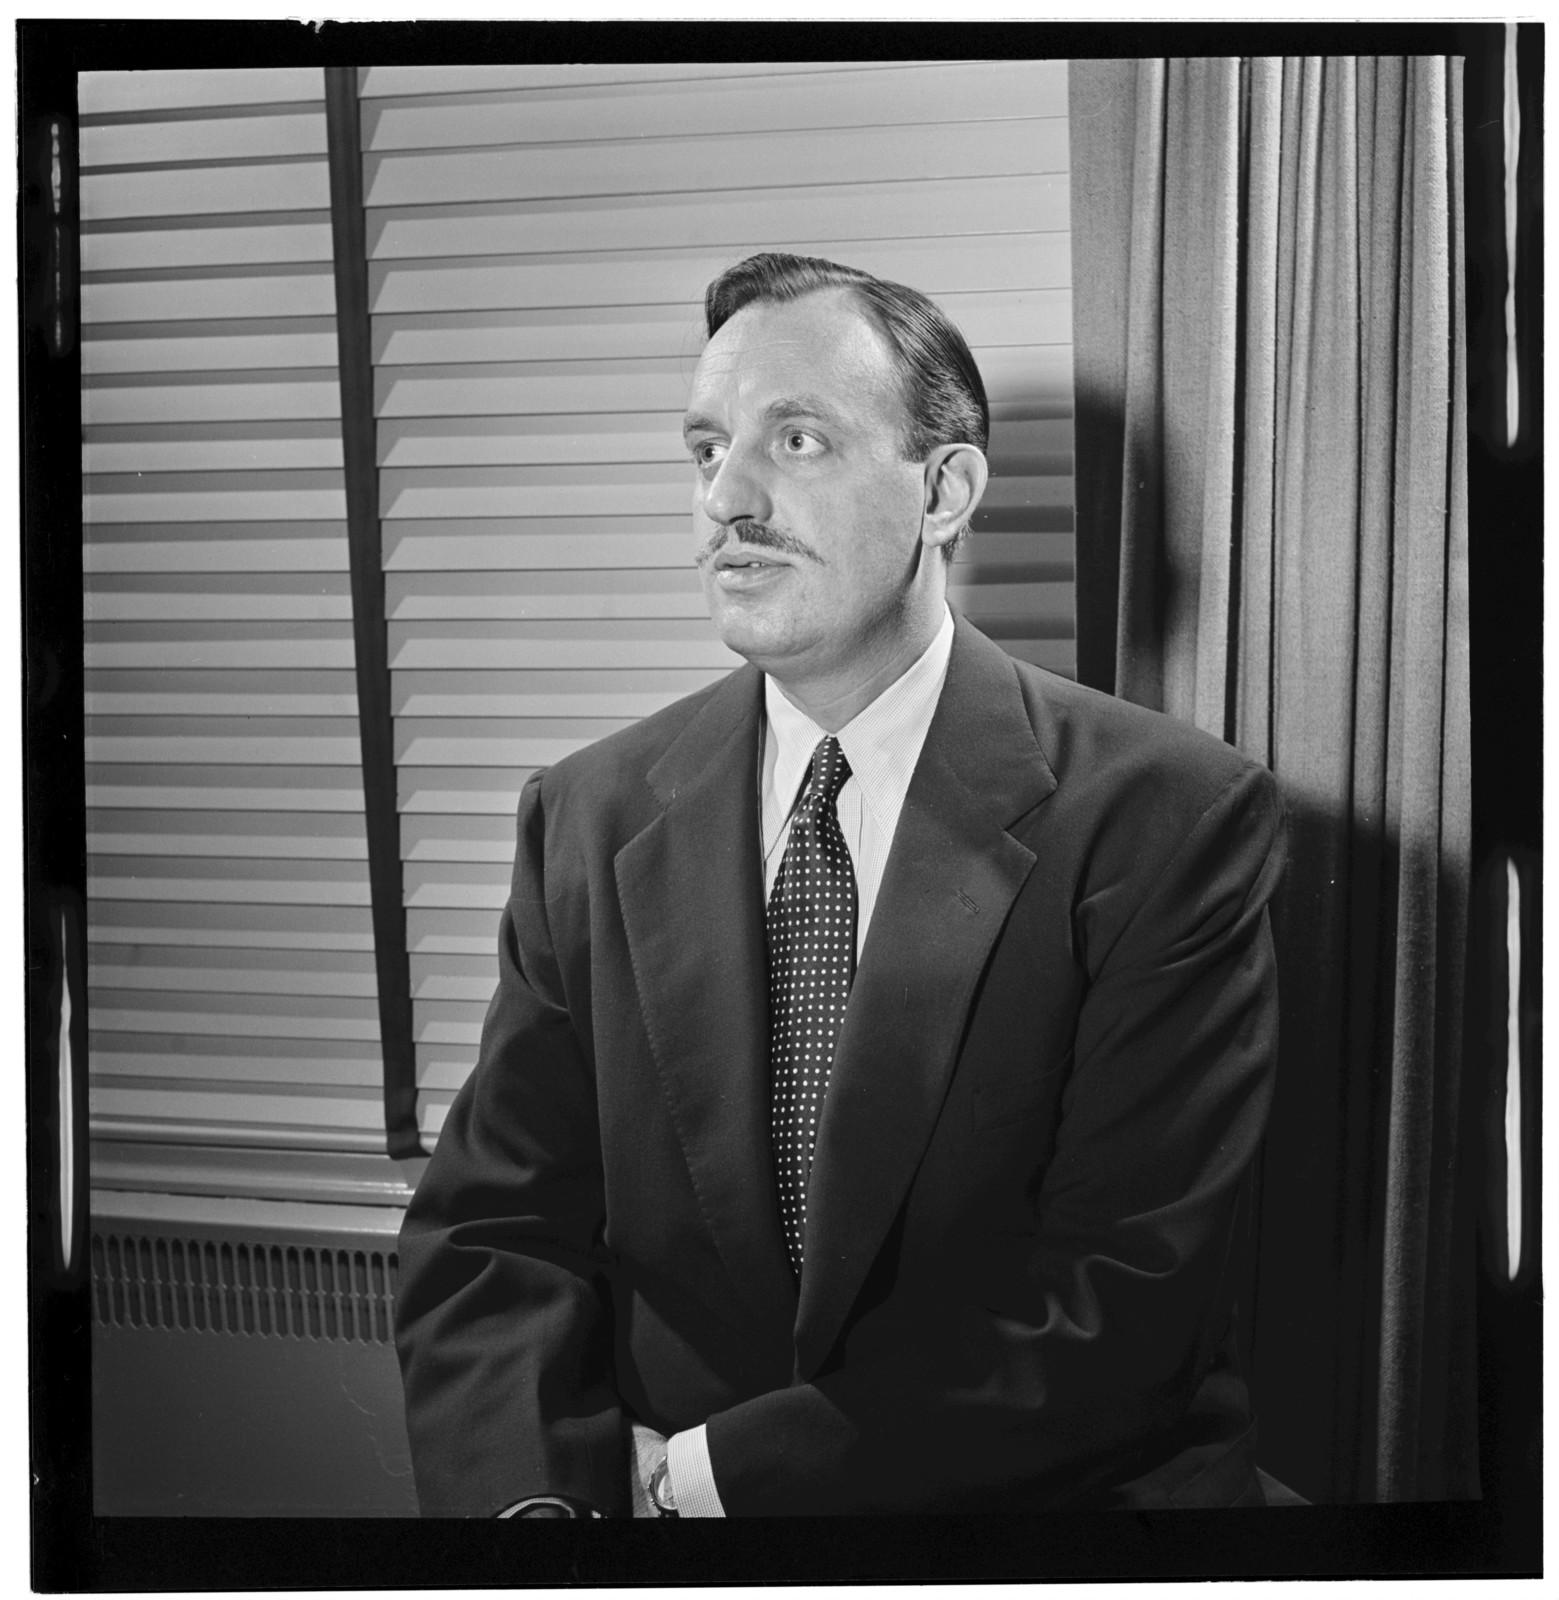 [Portrait of Brick Fleagle, New York, N.Y., between 1946 and 1948]